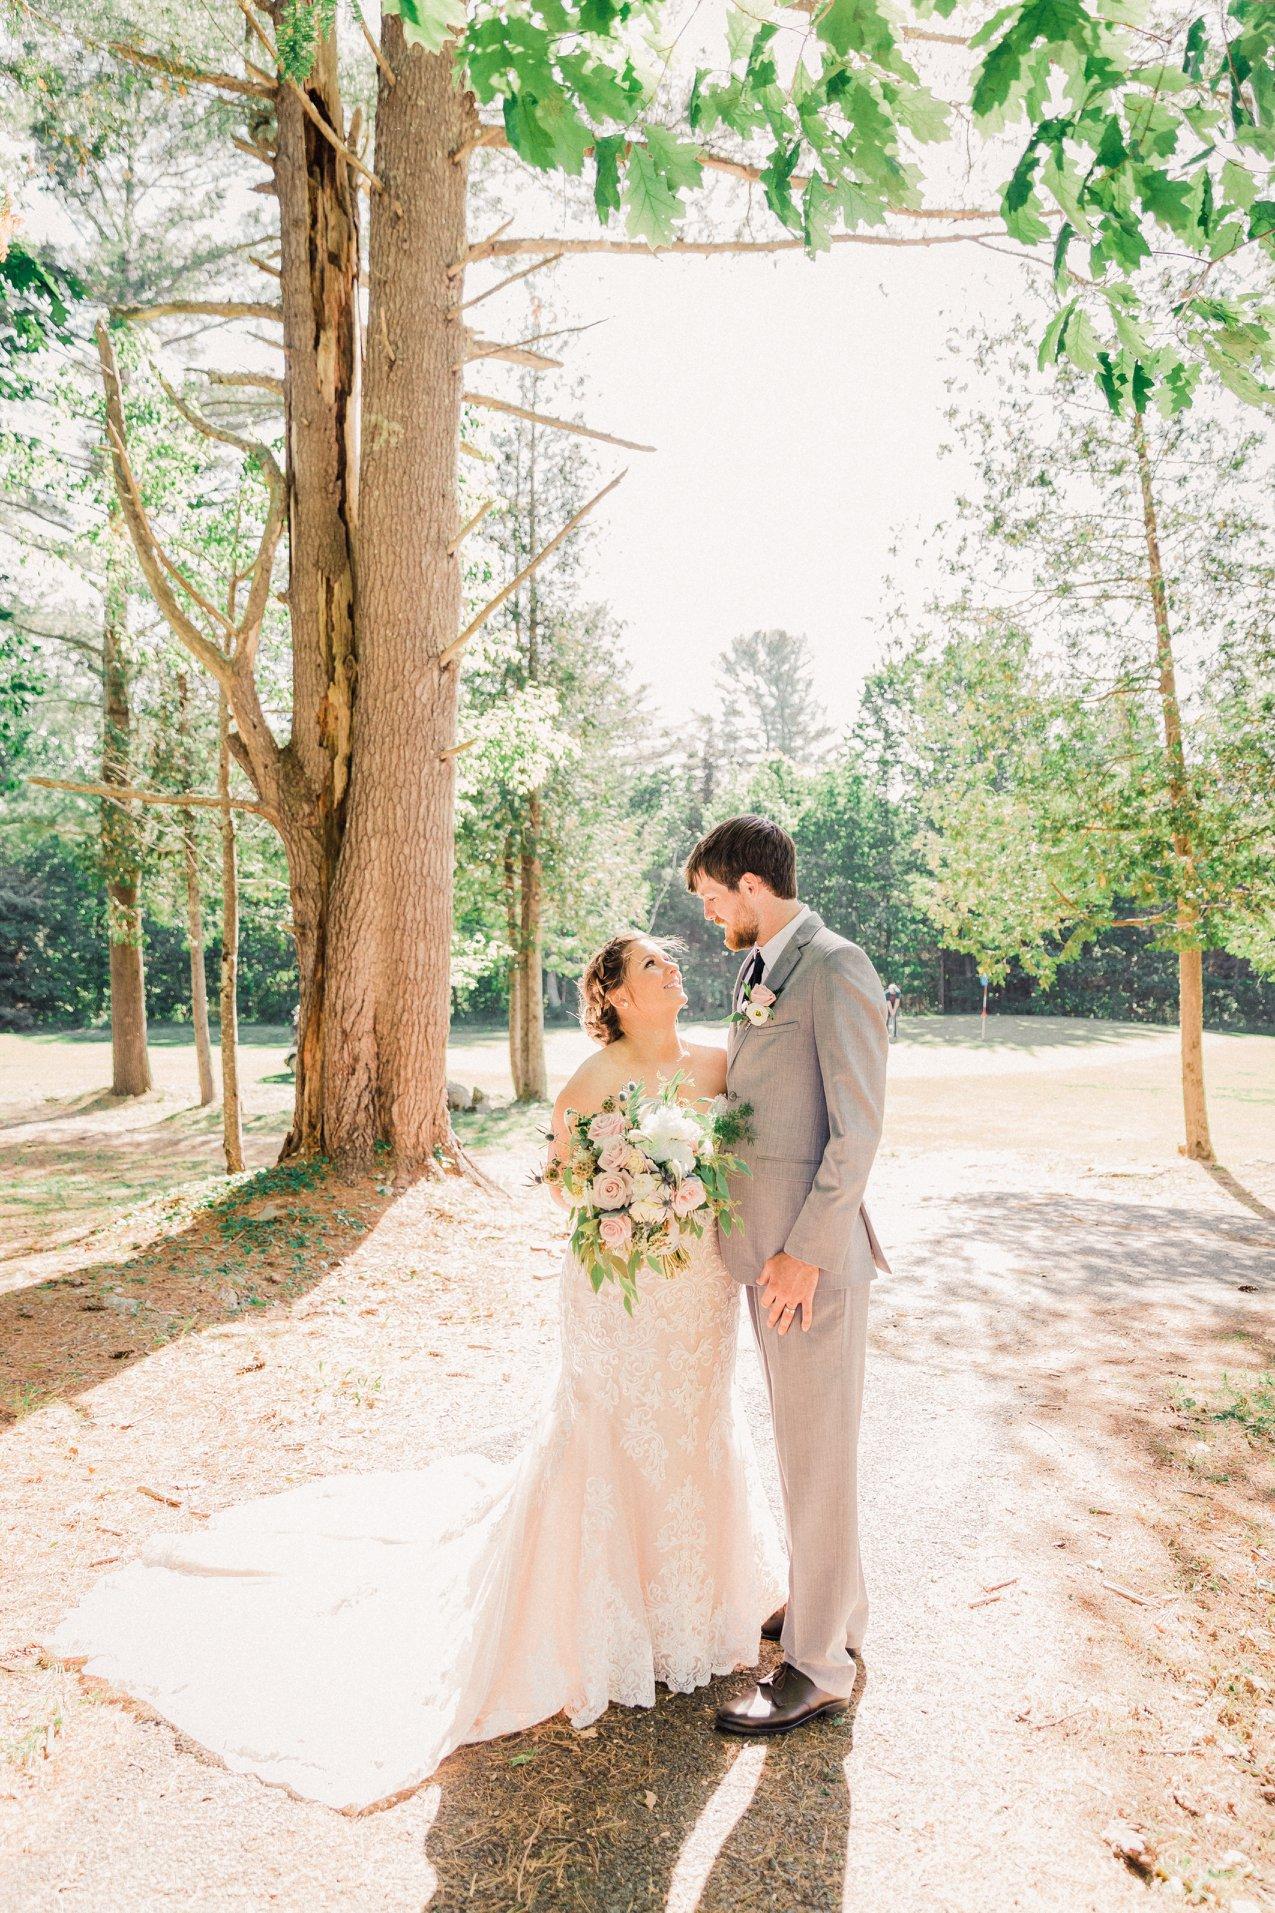 Sarah Marie Weddings